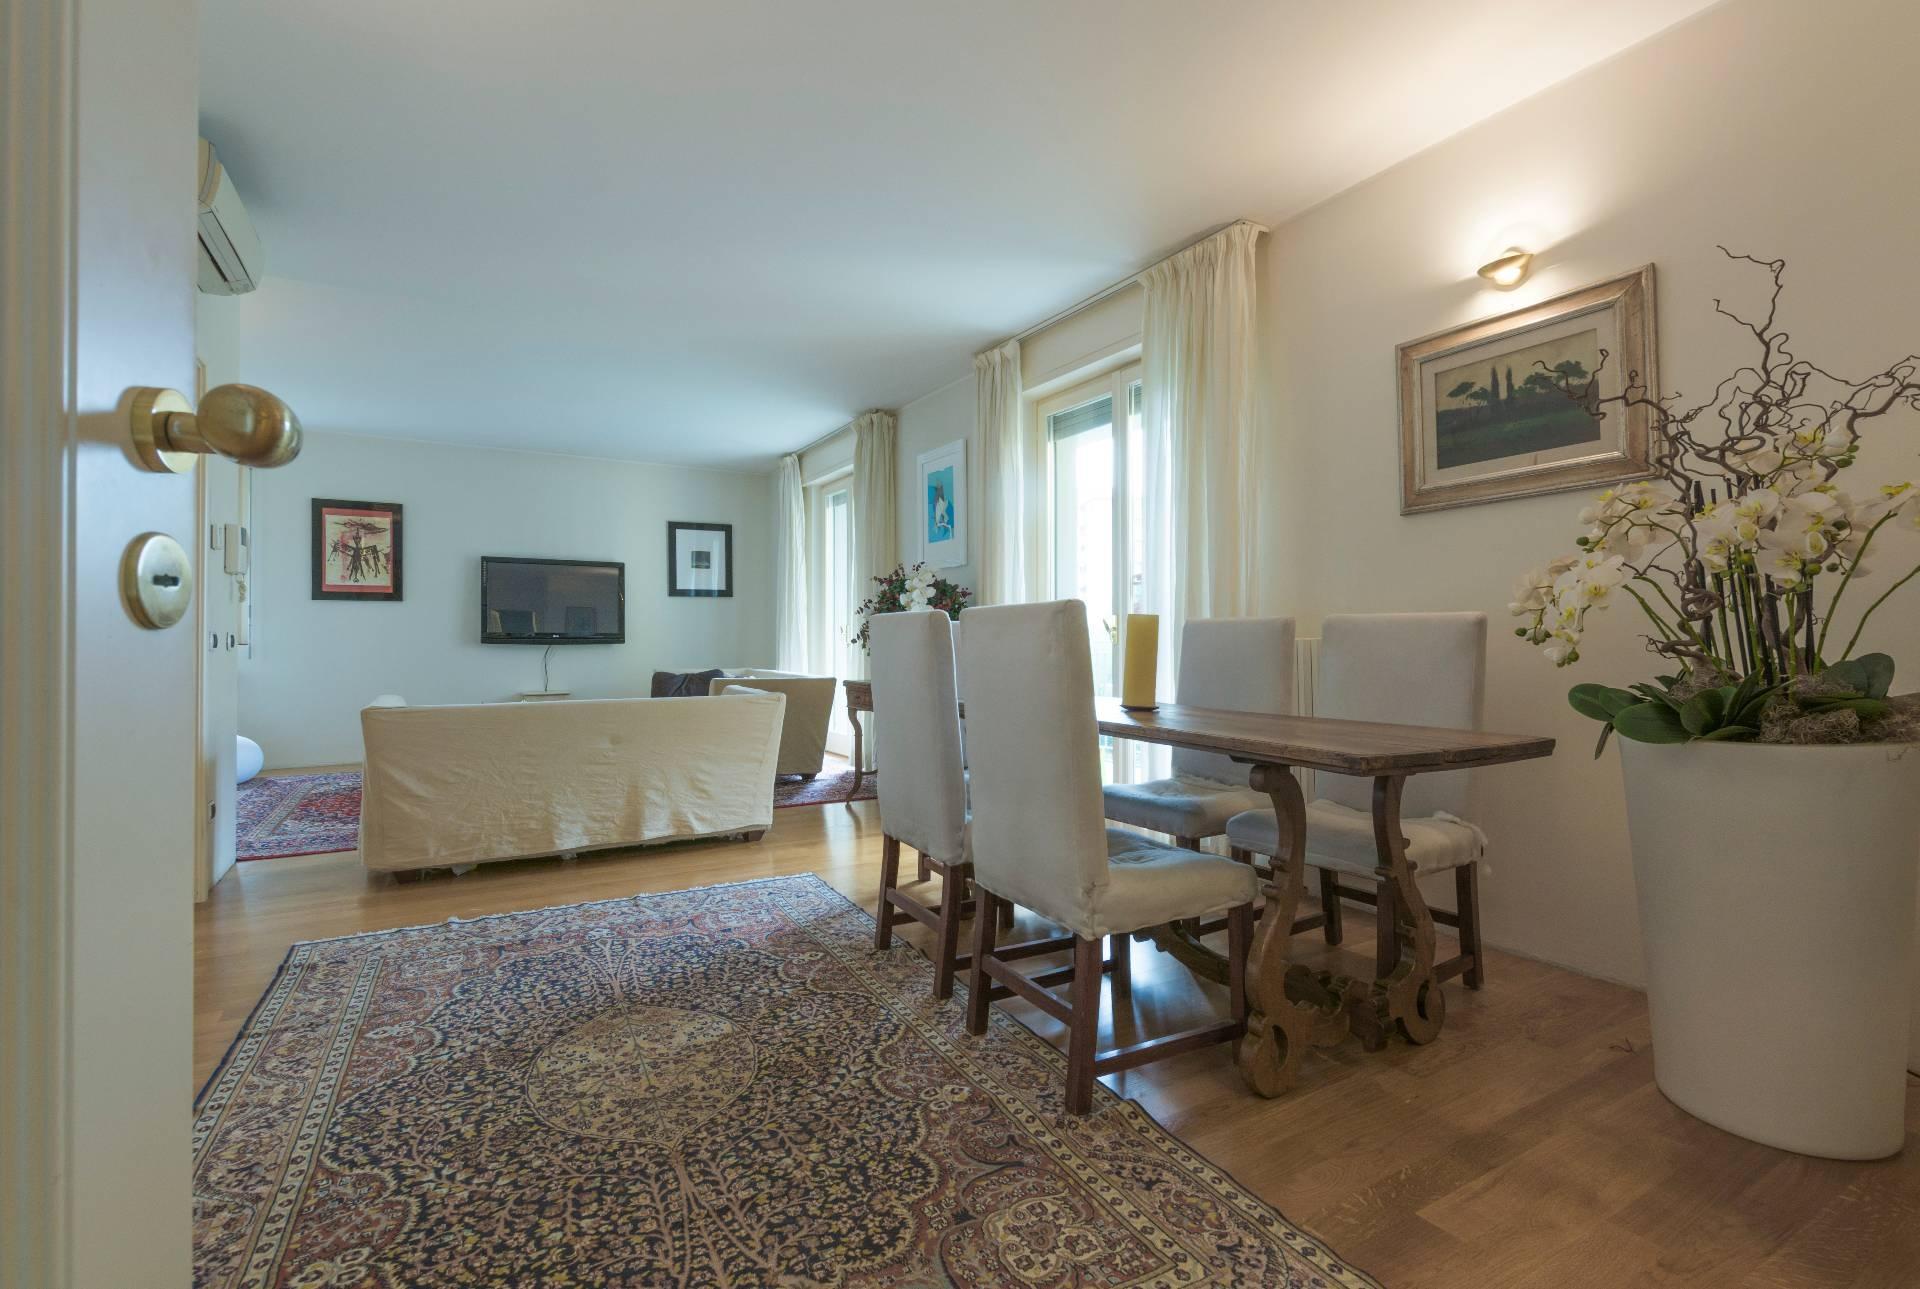 vendita appartamento milano washinghton  595000 euro  4 locali  144 mq